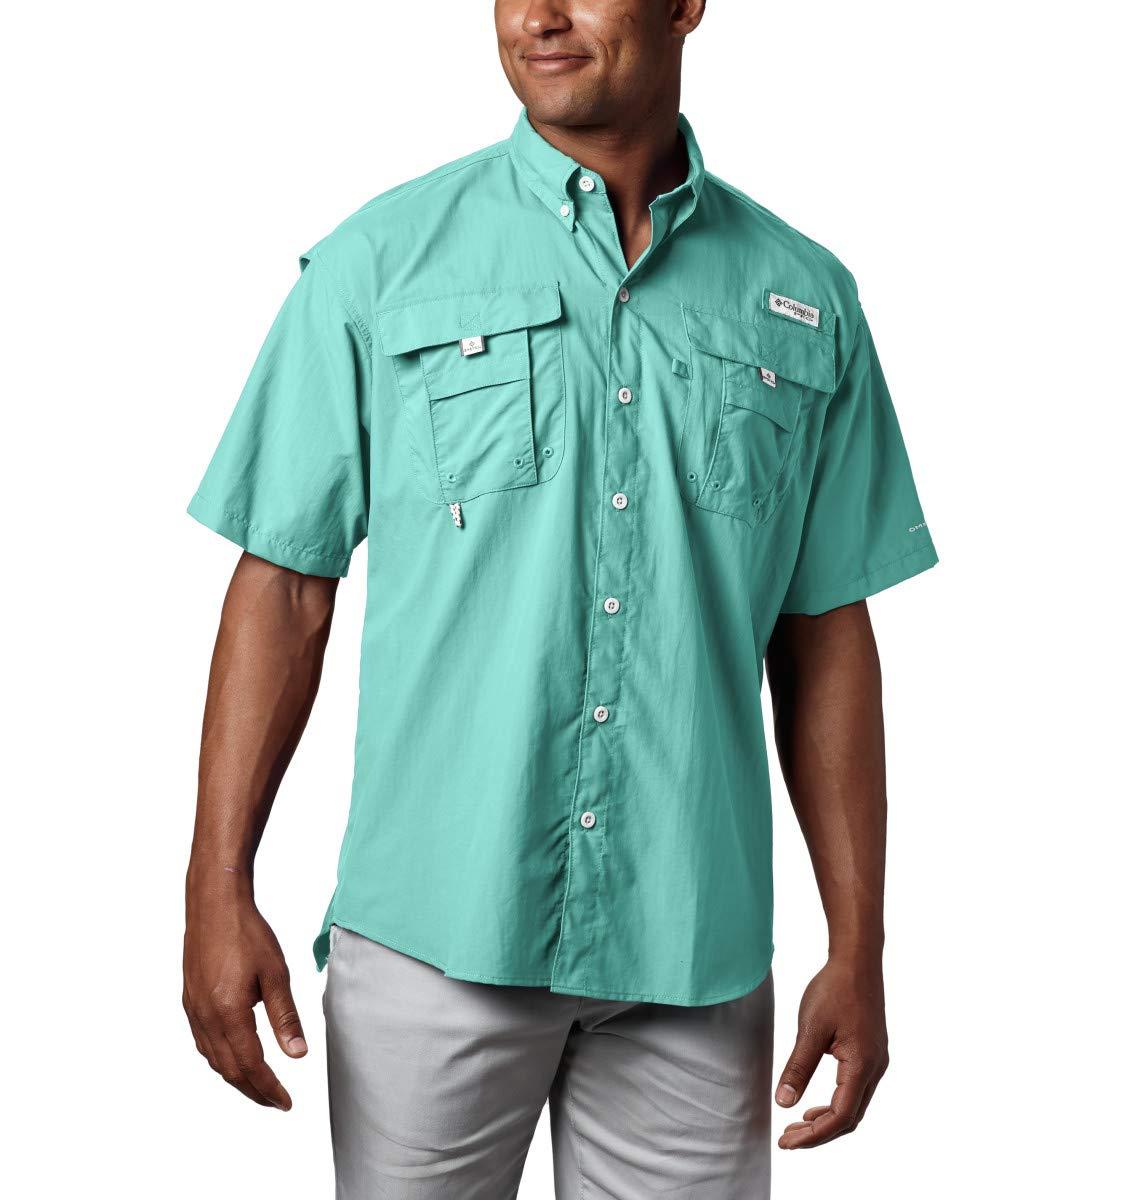 Columbia Men's PFG Bahama II Short Sleeve Shirt, Breathable with UV Protection by Columbia